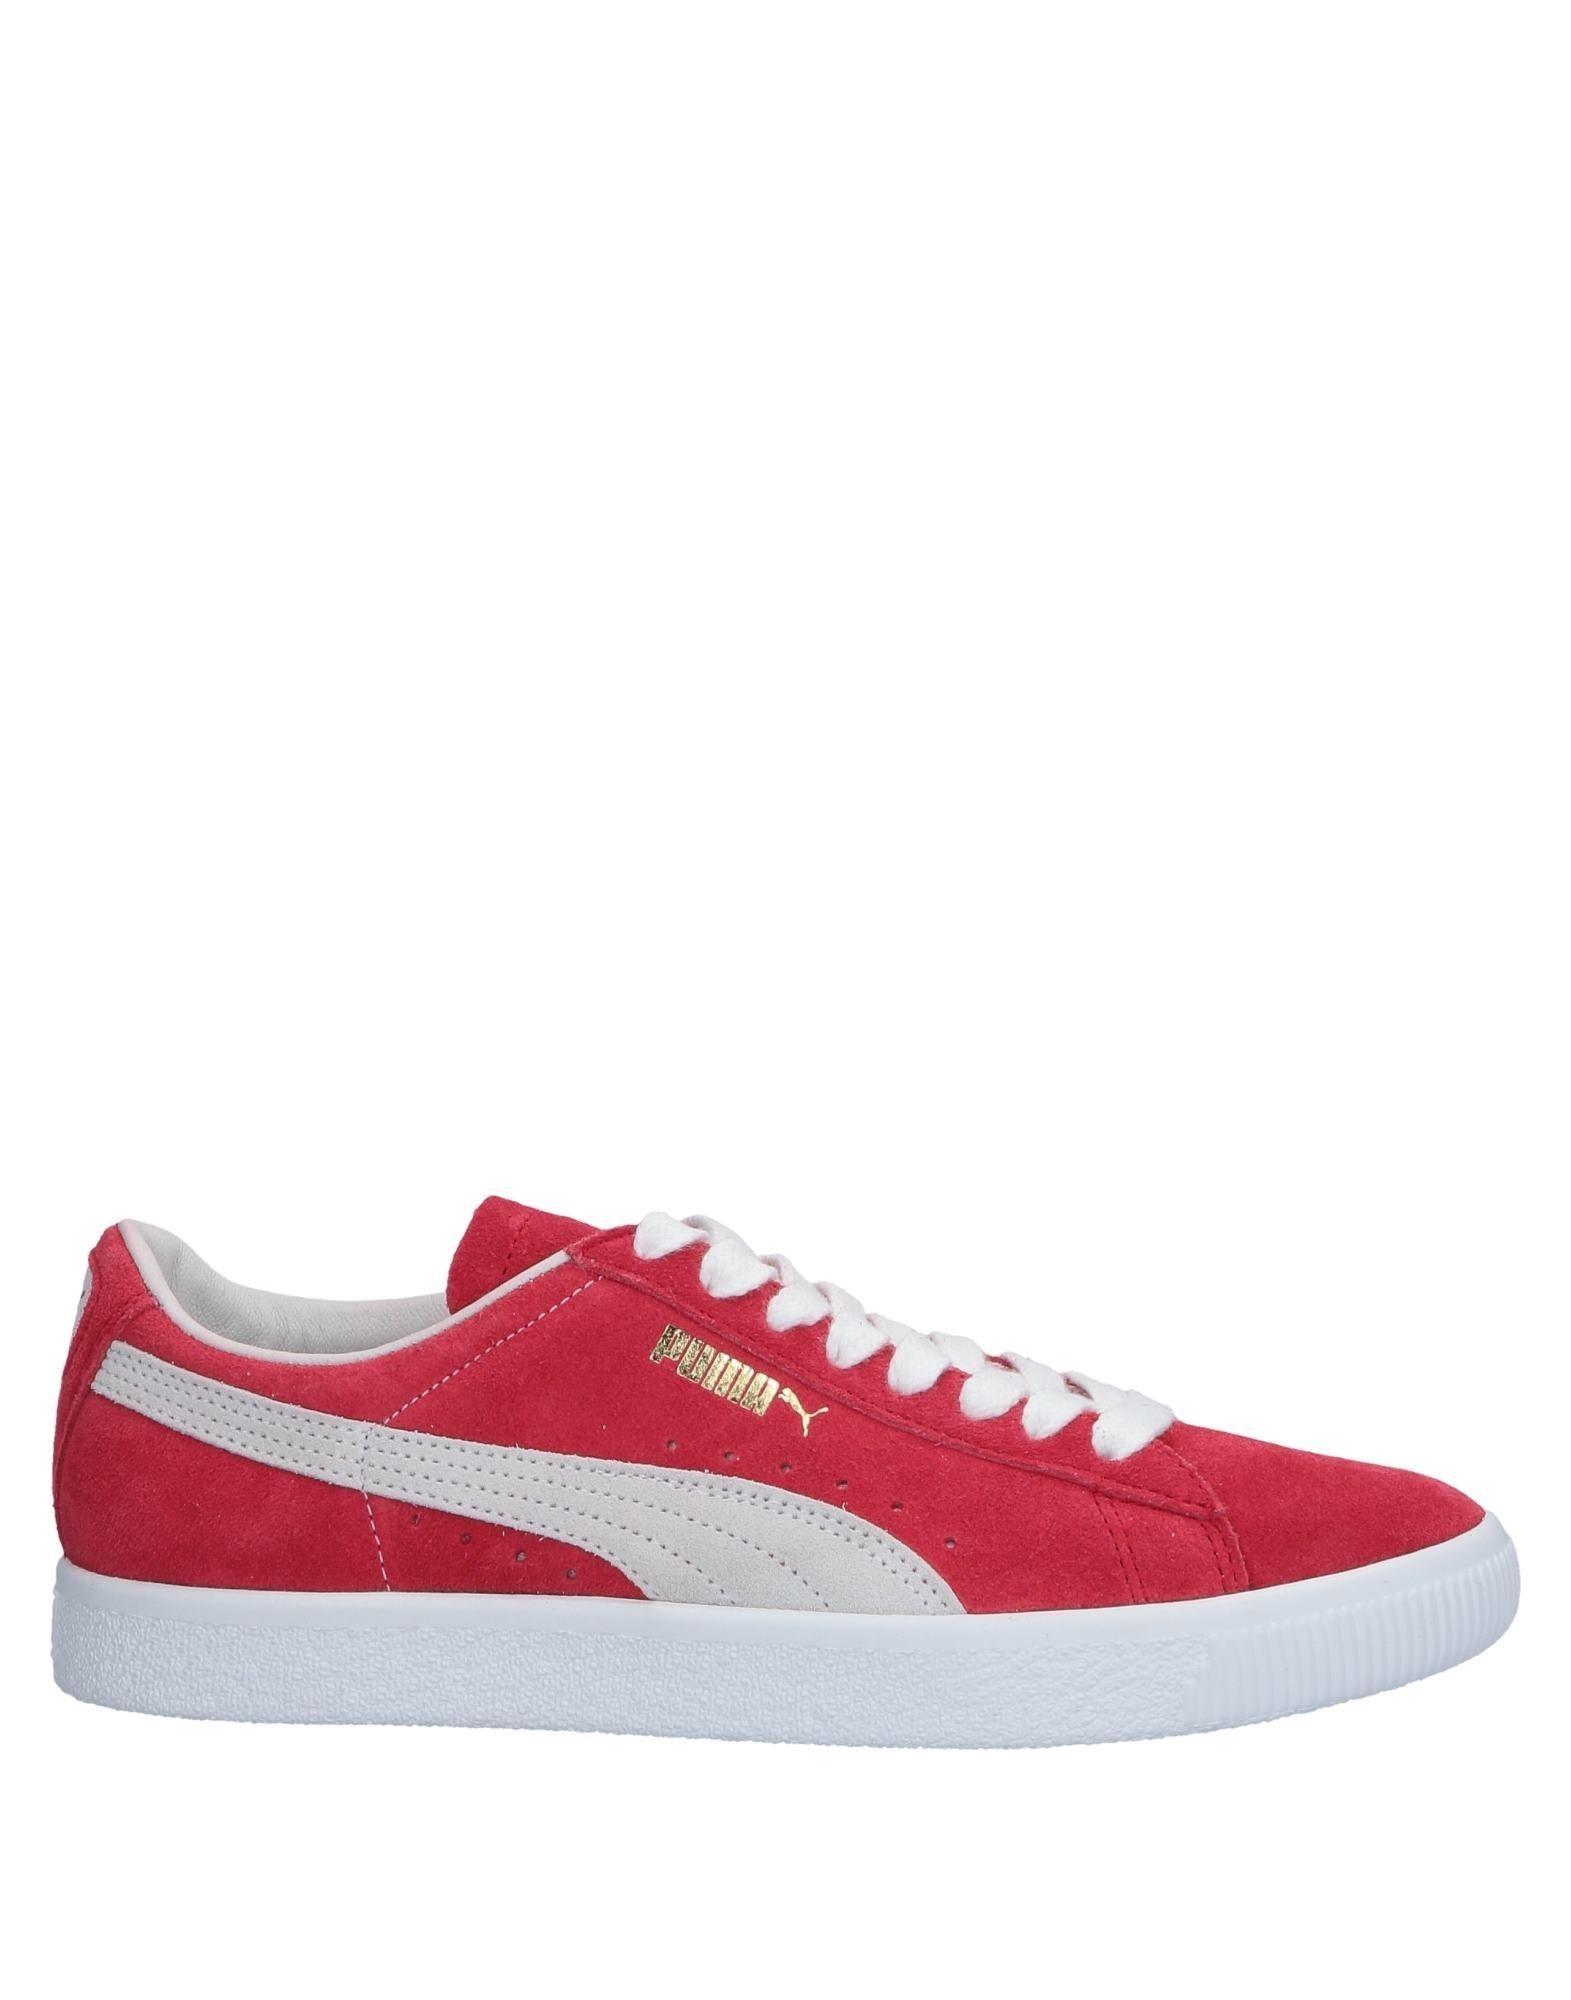 PUMA SNEAKERS.  puma  shoes  f5356cced